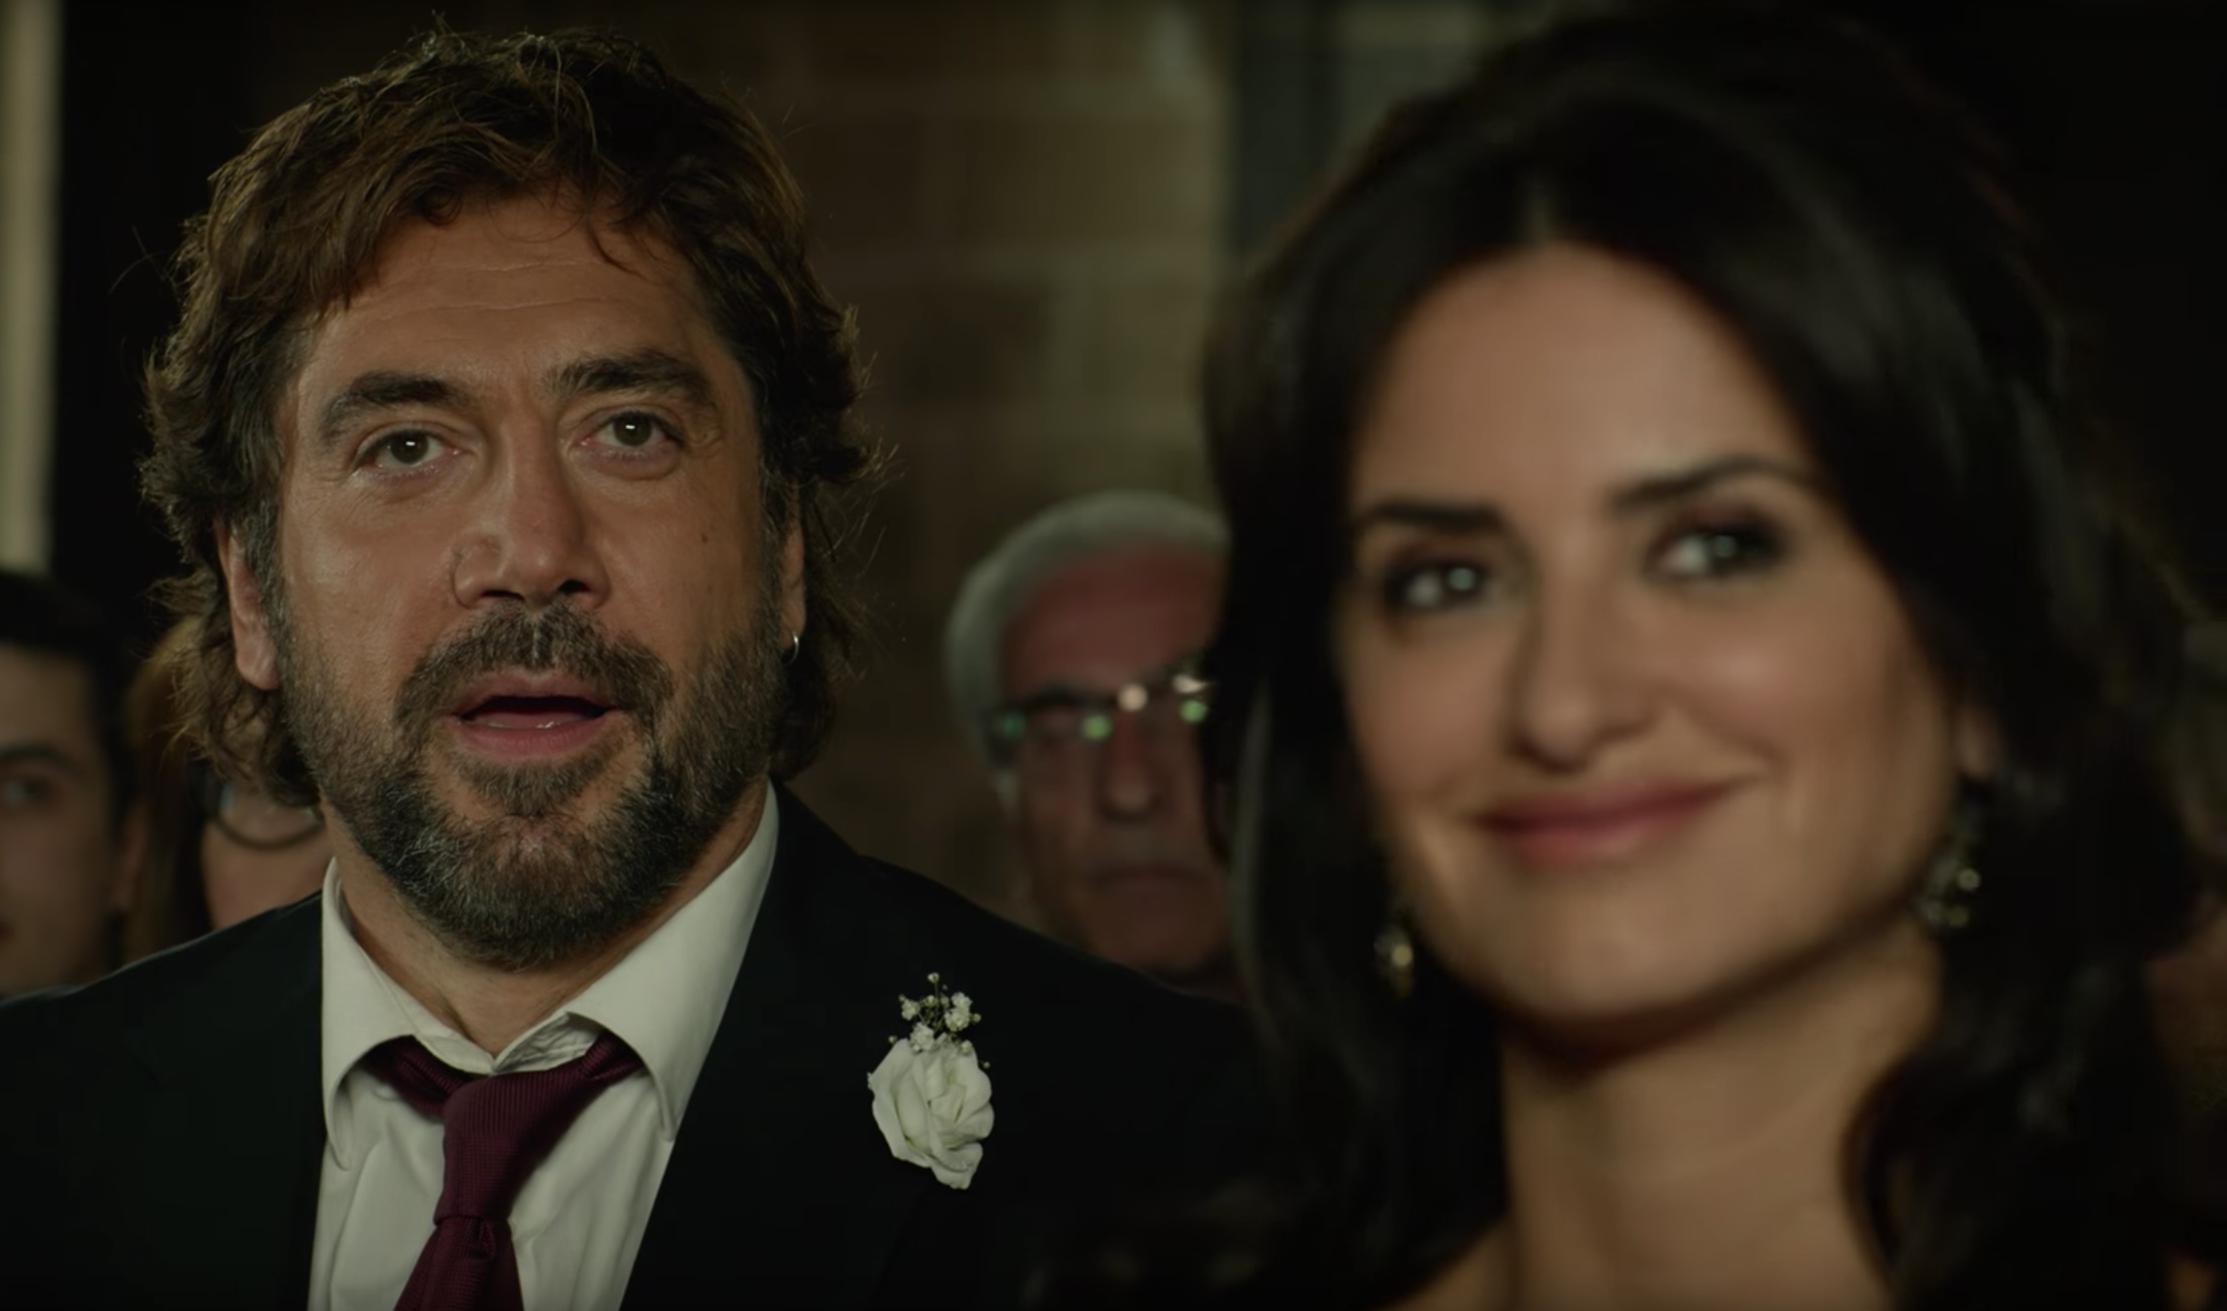 'Everybody Knows' Trailer: Penélope Cruz and Javier Bardem Team Up to Fall Apart